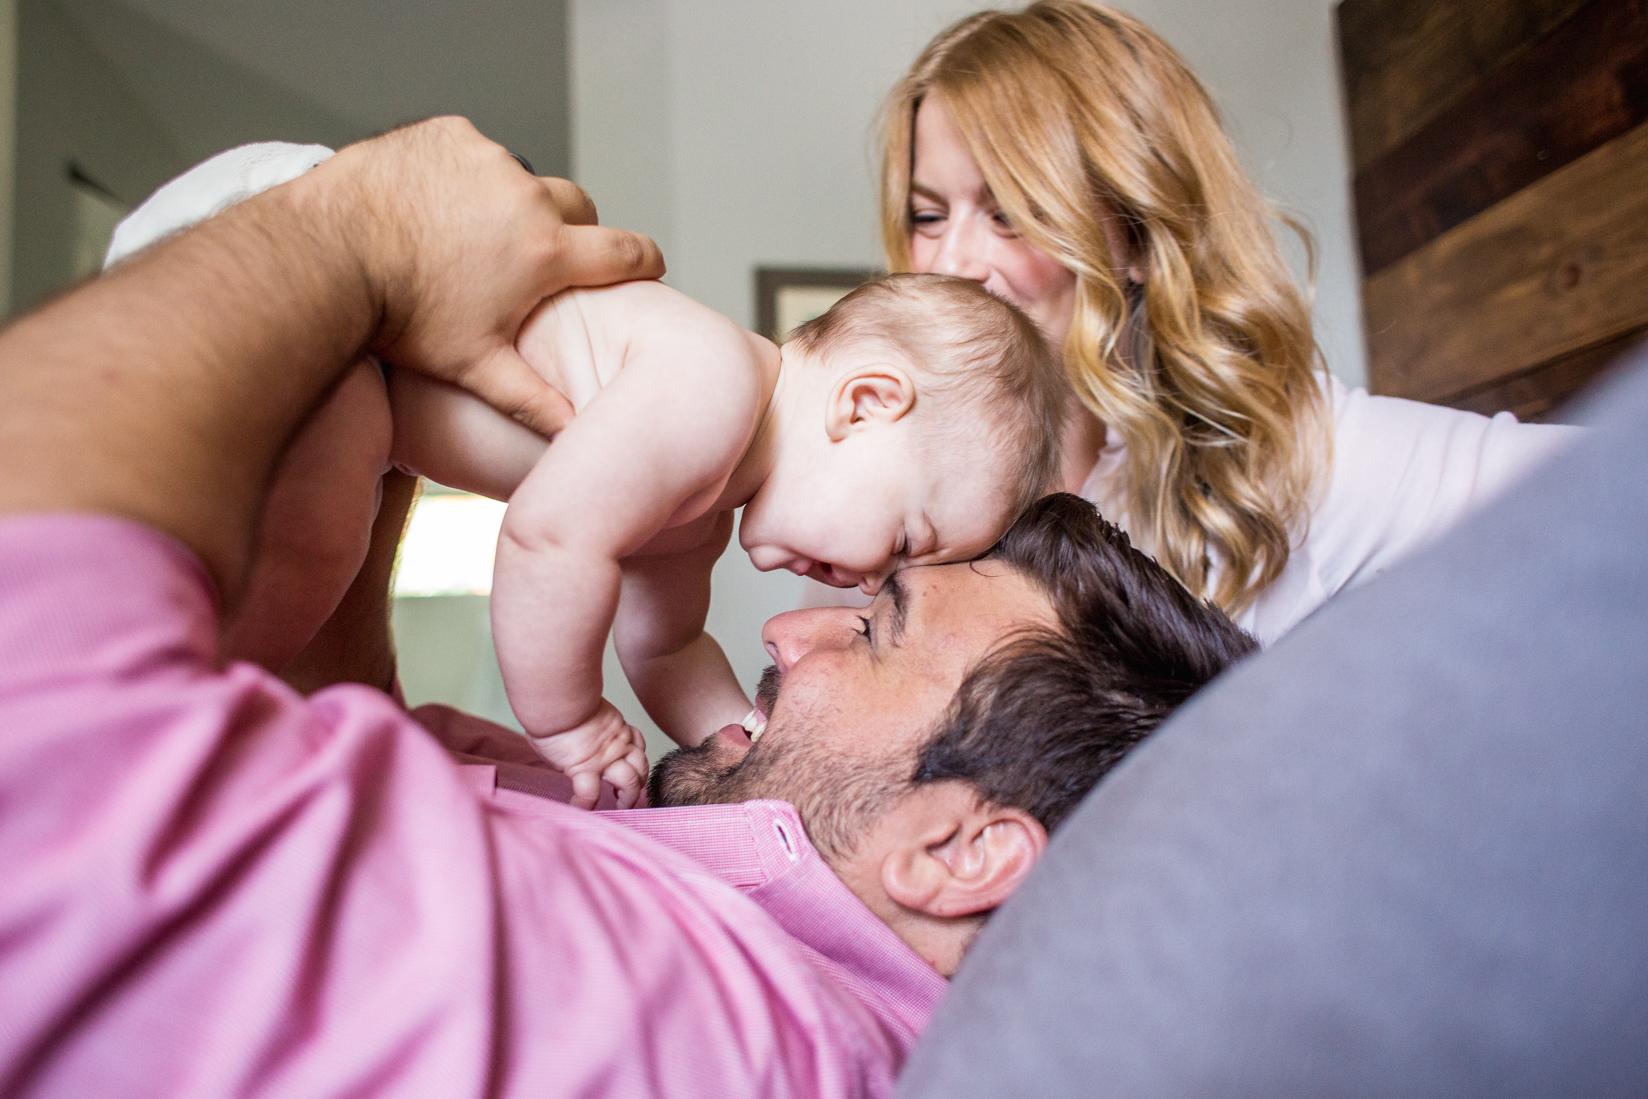 boca-raton-family-photographer-delray-beach-lifestyle-newborn-baby-home-photo-shoot-session-3.jpg